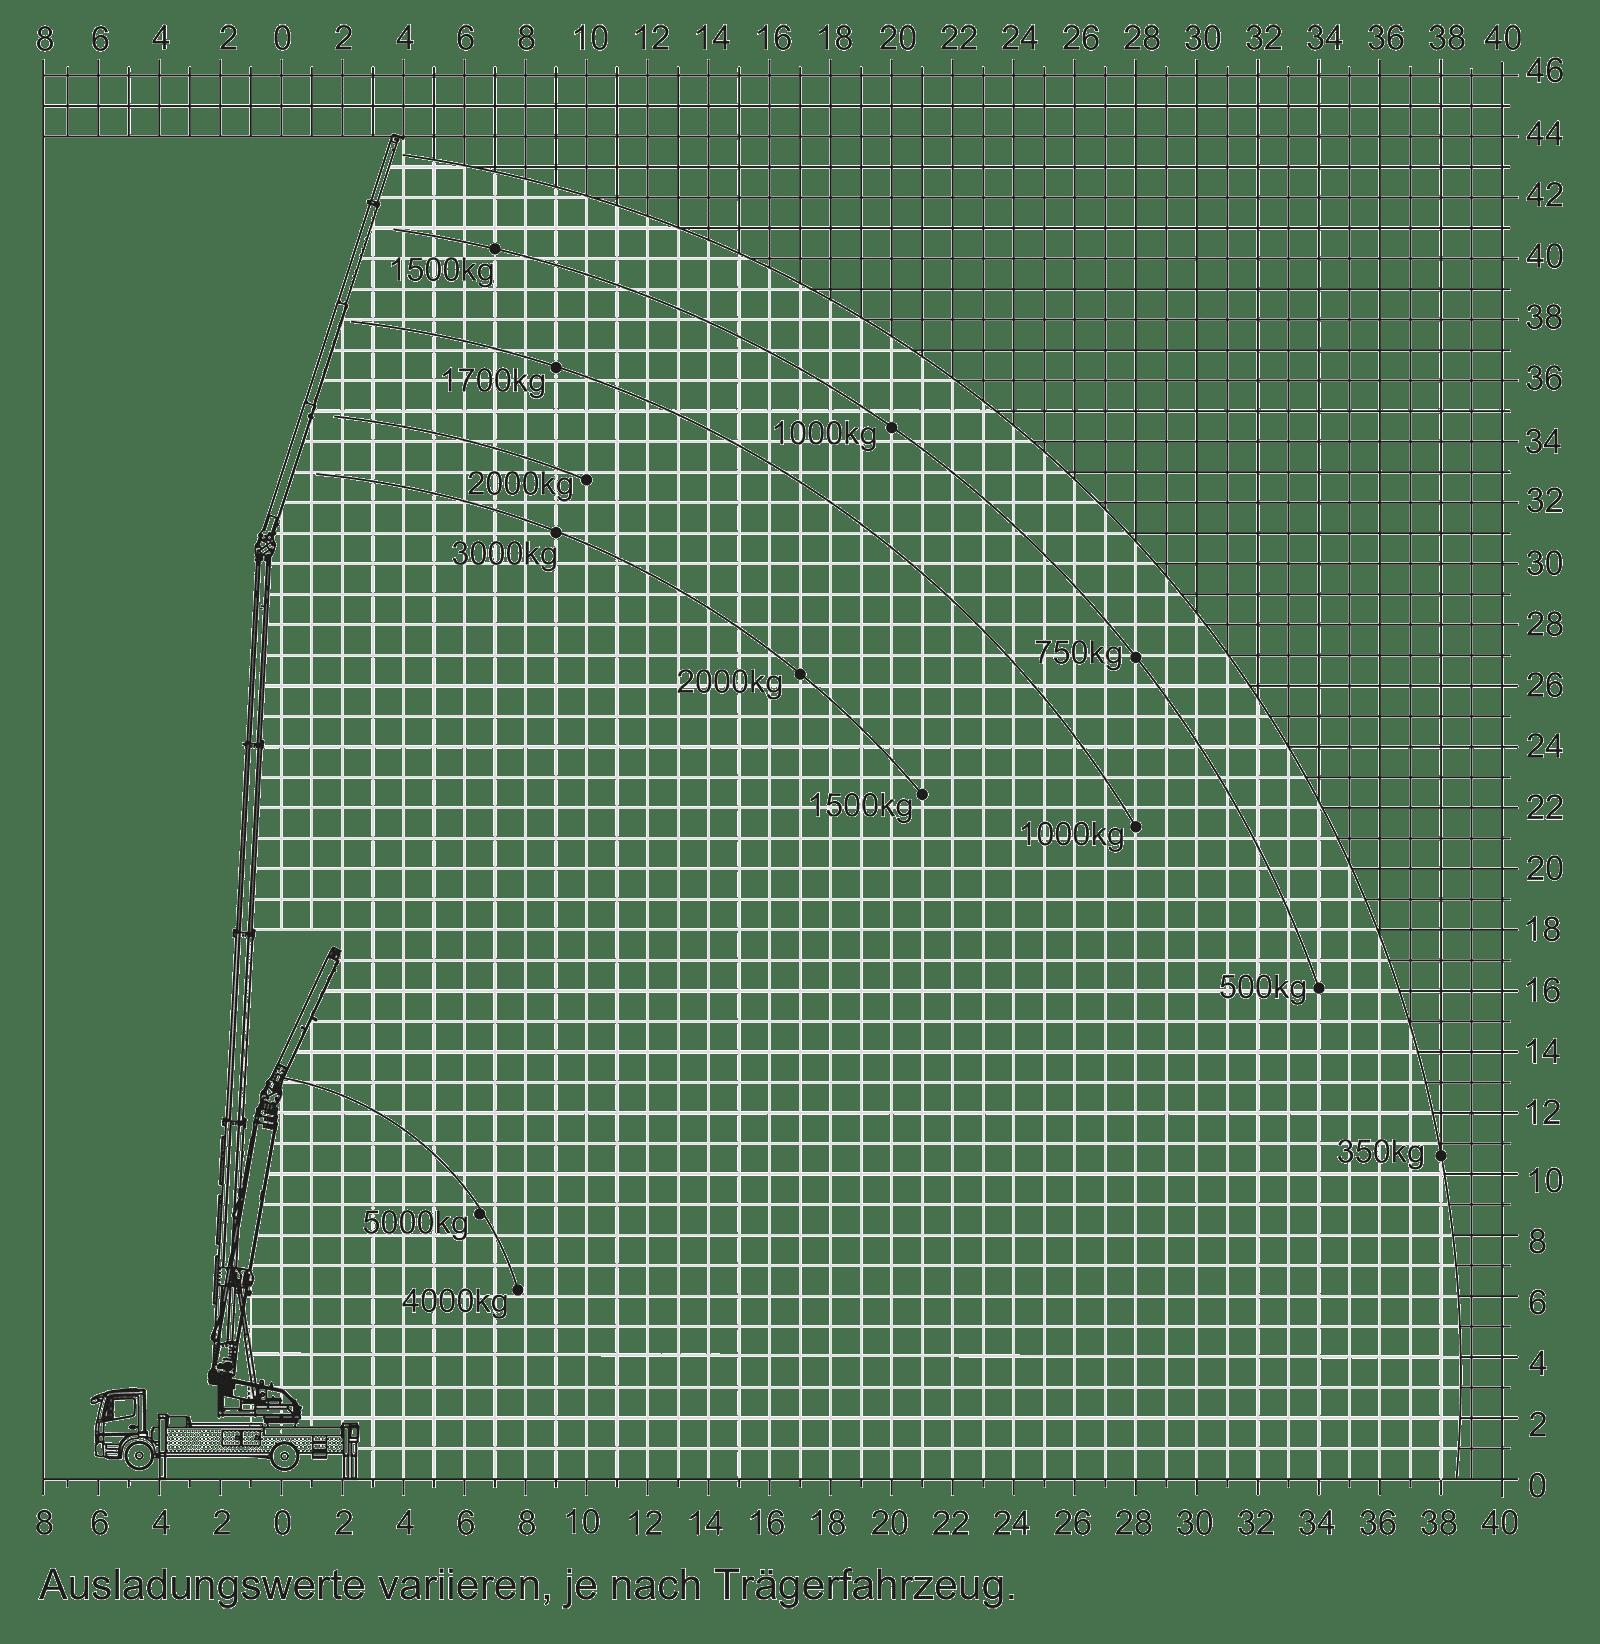 K950 Rsx Klaas Anhngerkrane Autokrane Mbelaufzge Engine Diagram Kranbetrieb